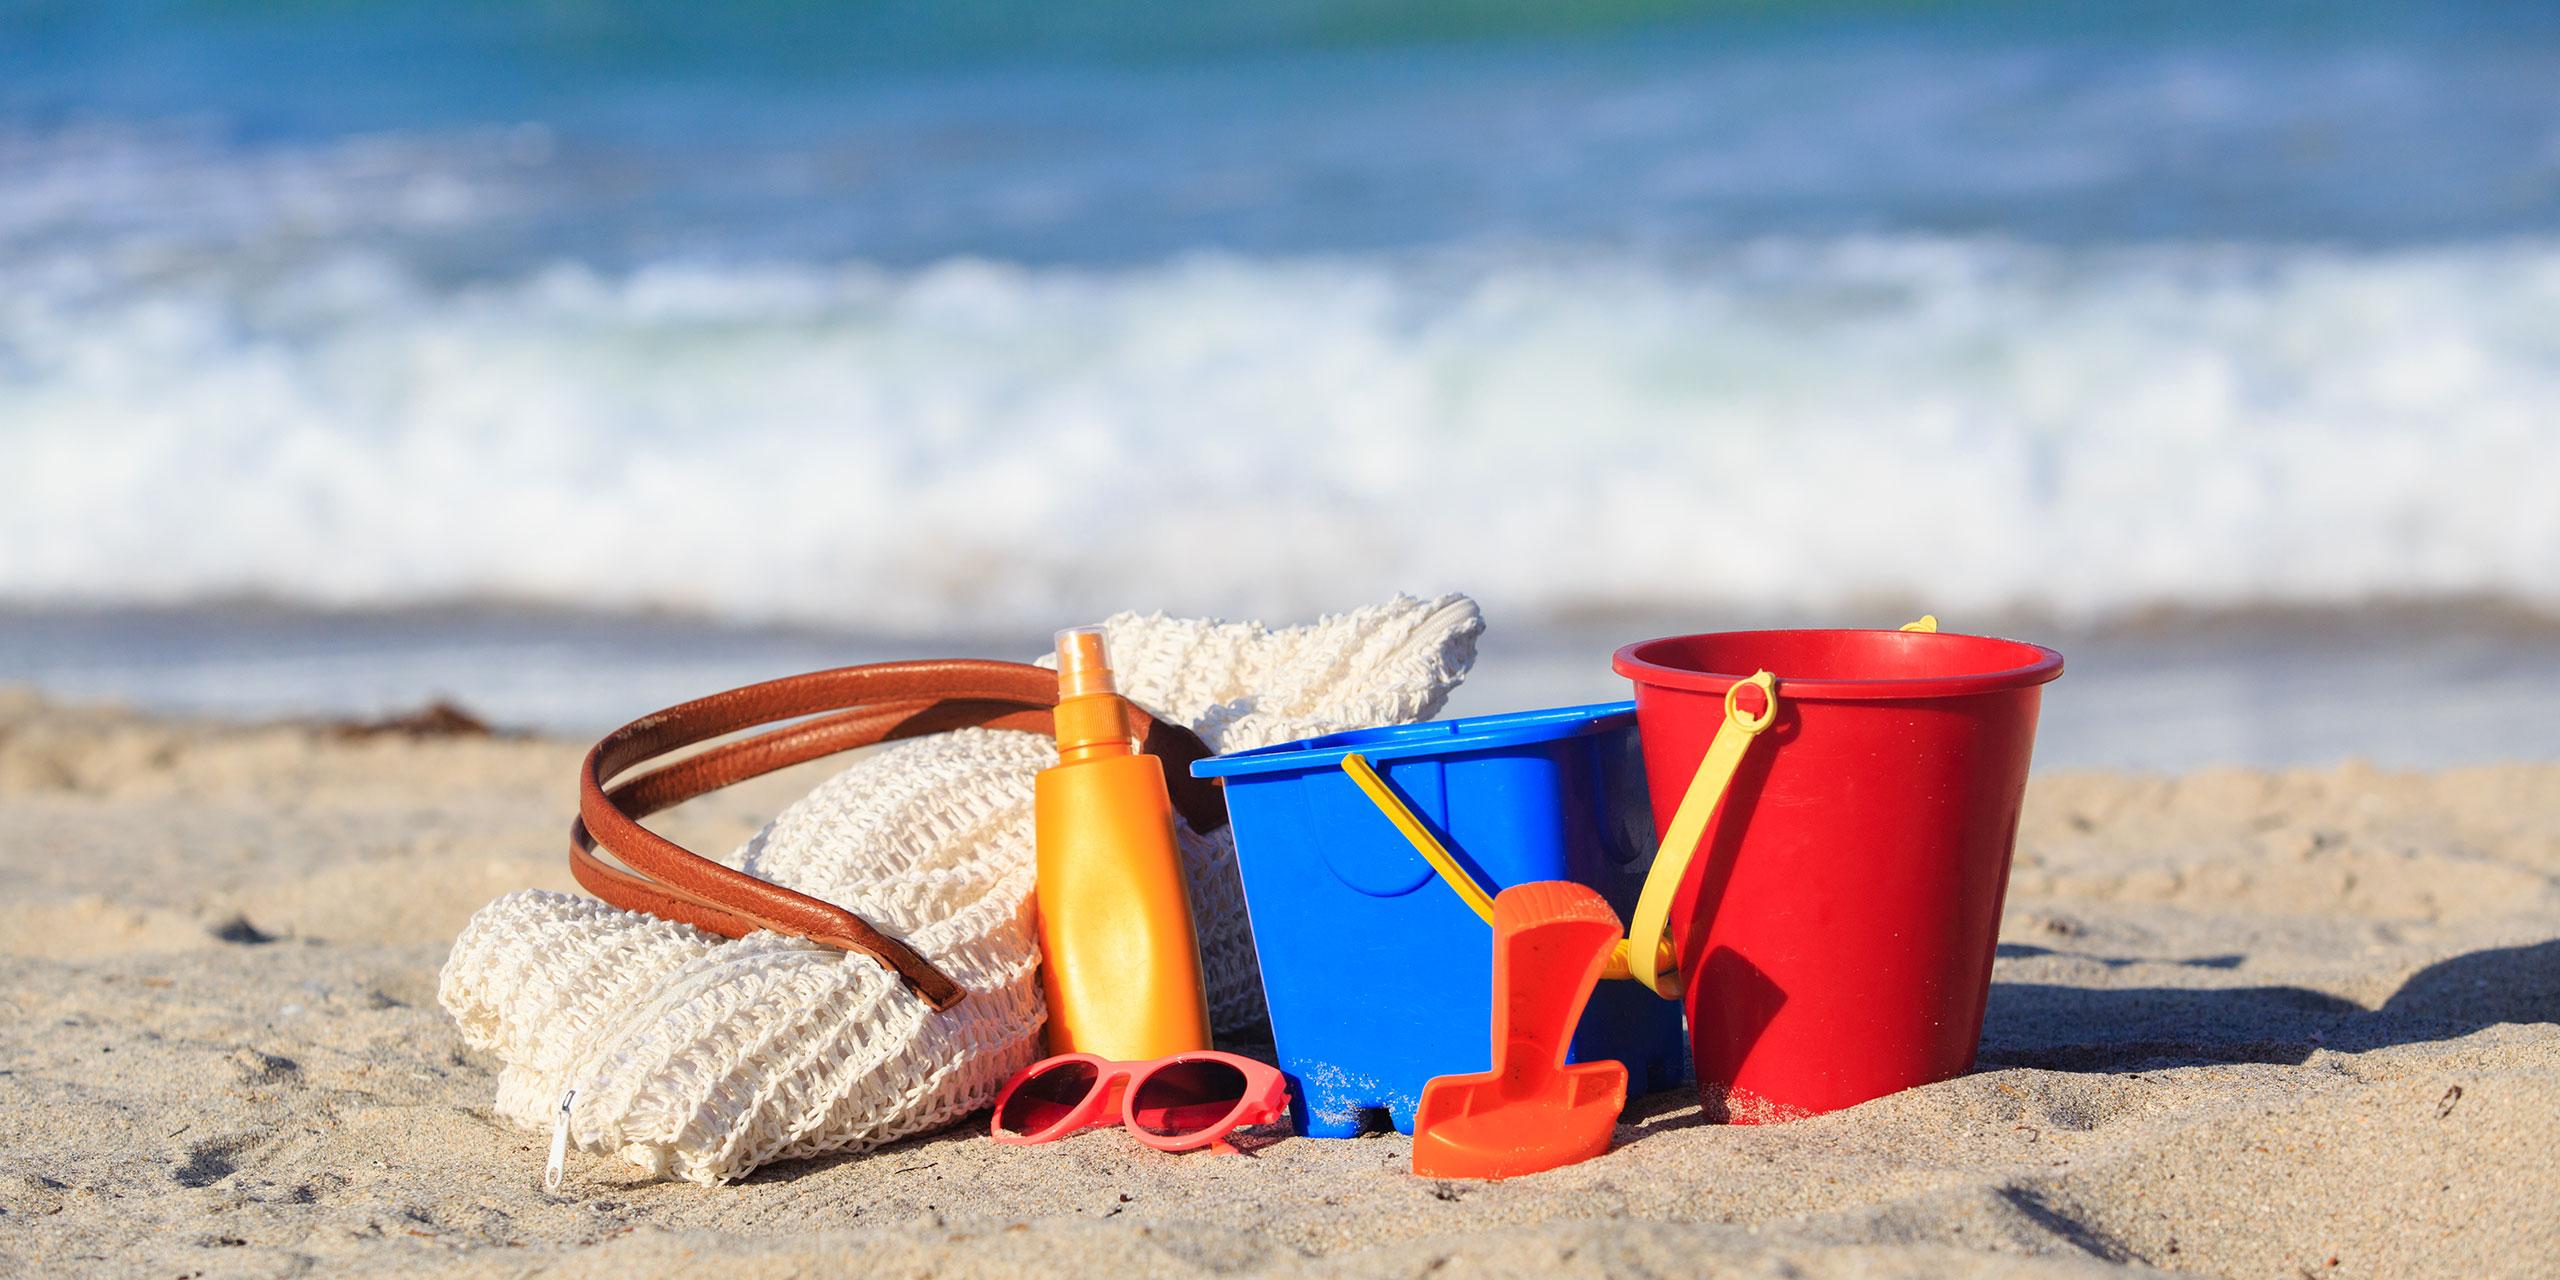 Beach Bag; Courtesy of NadyaEugene/Shutterstock.com